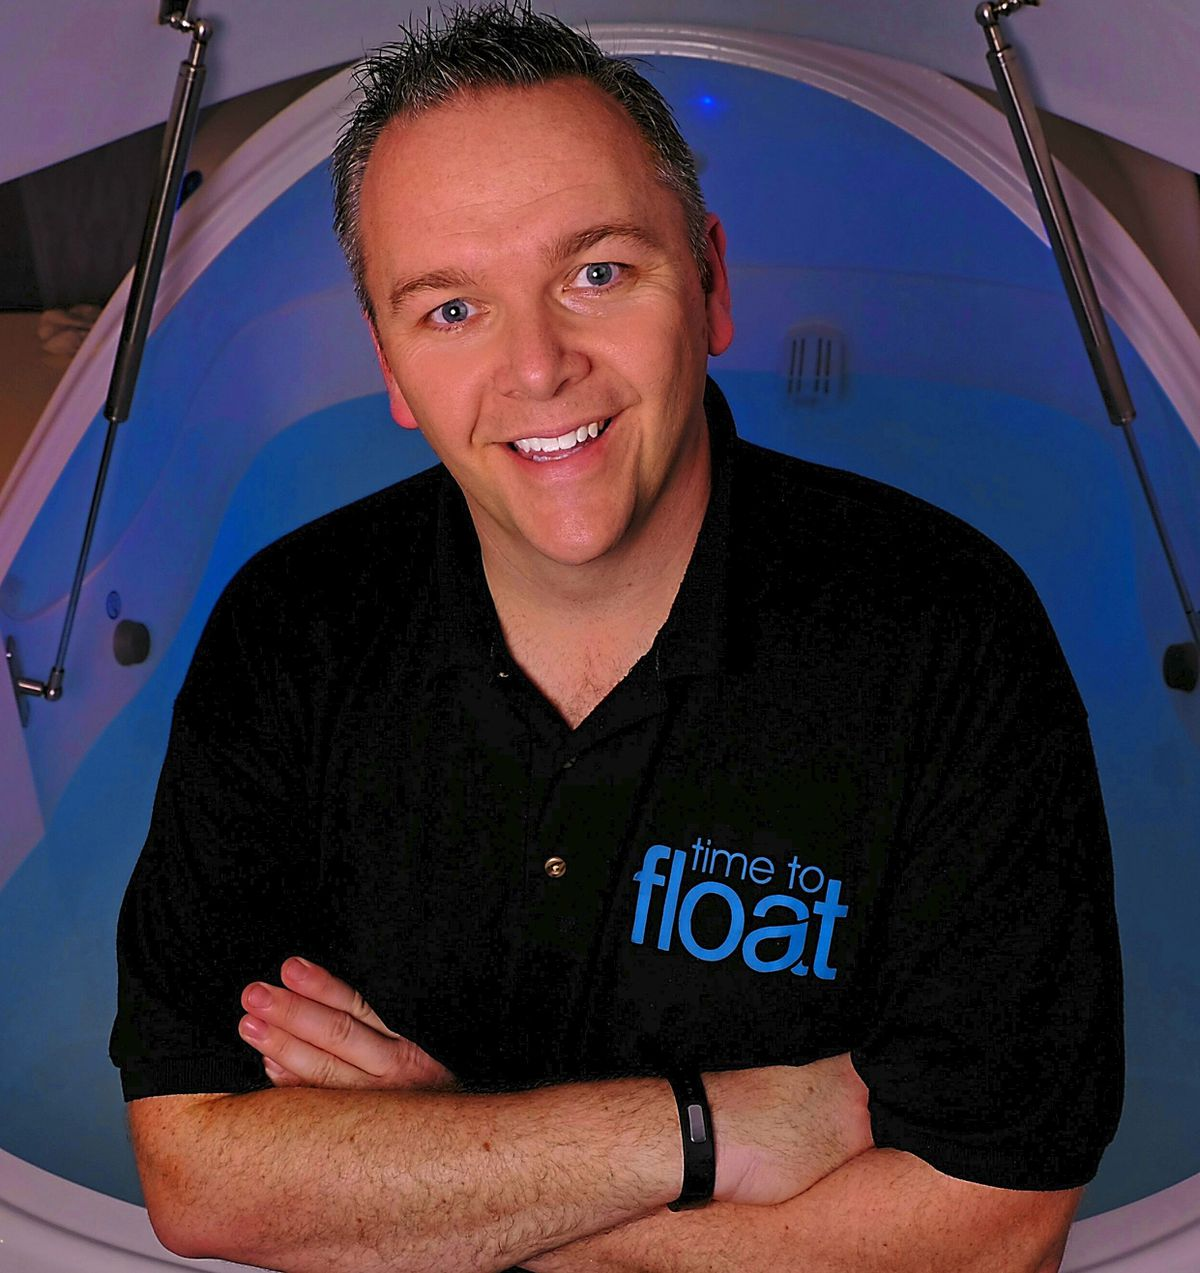 Mark Smethurst who runs Time To Float